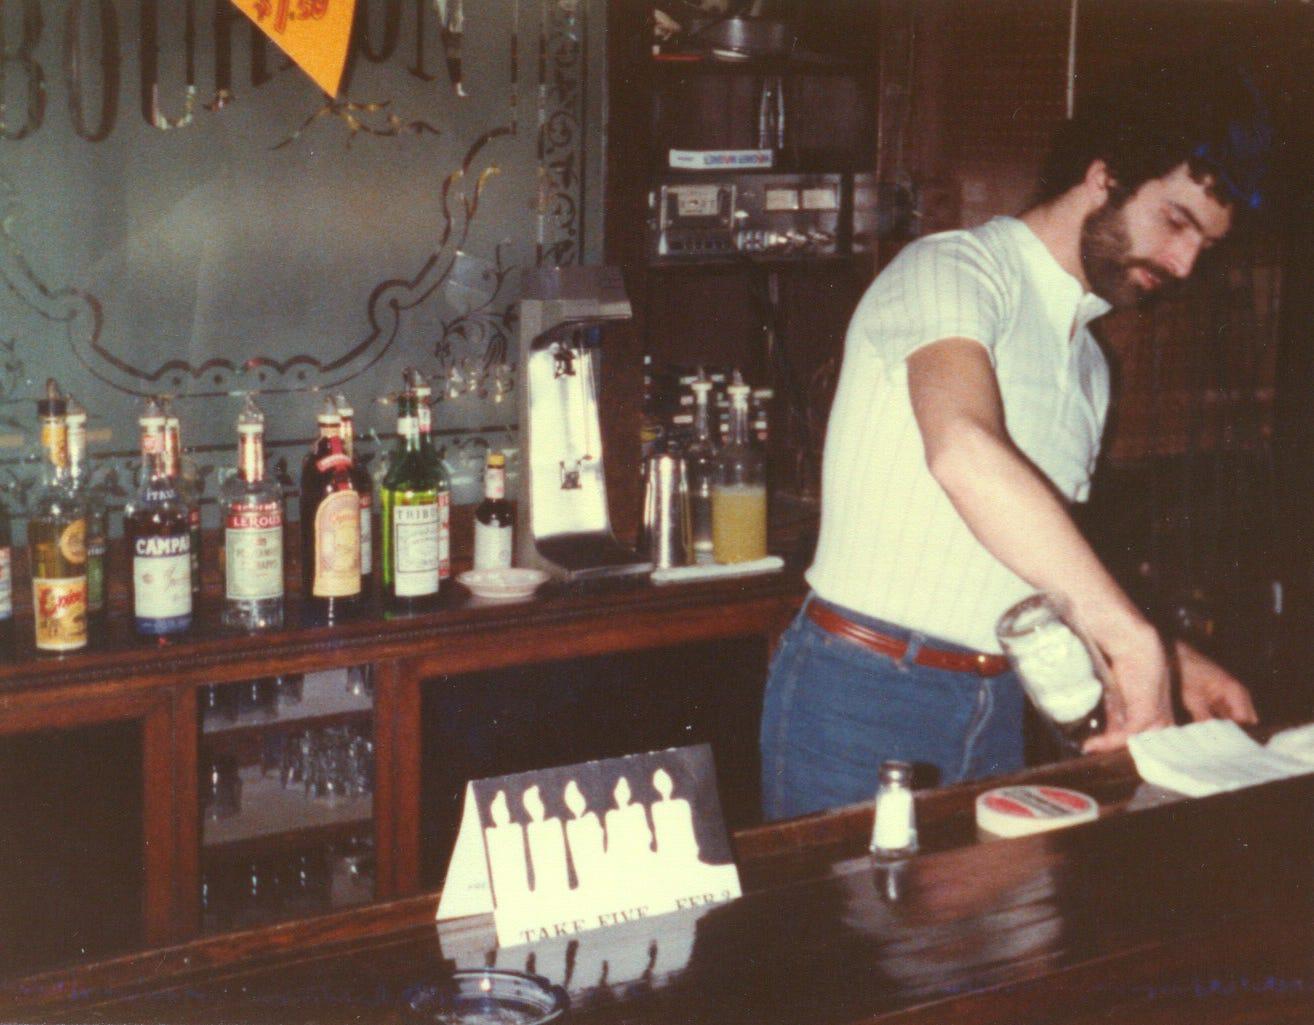 St paul shemale club bar